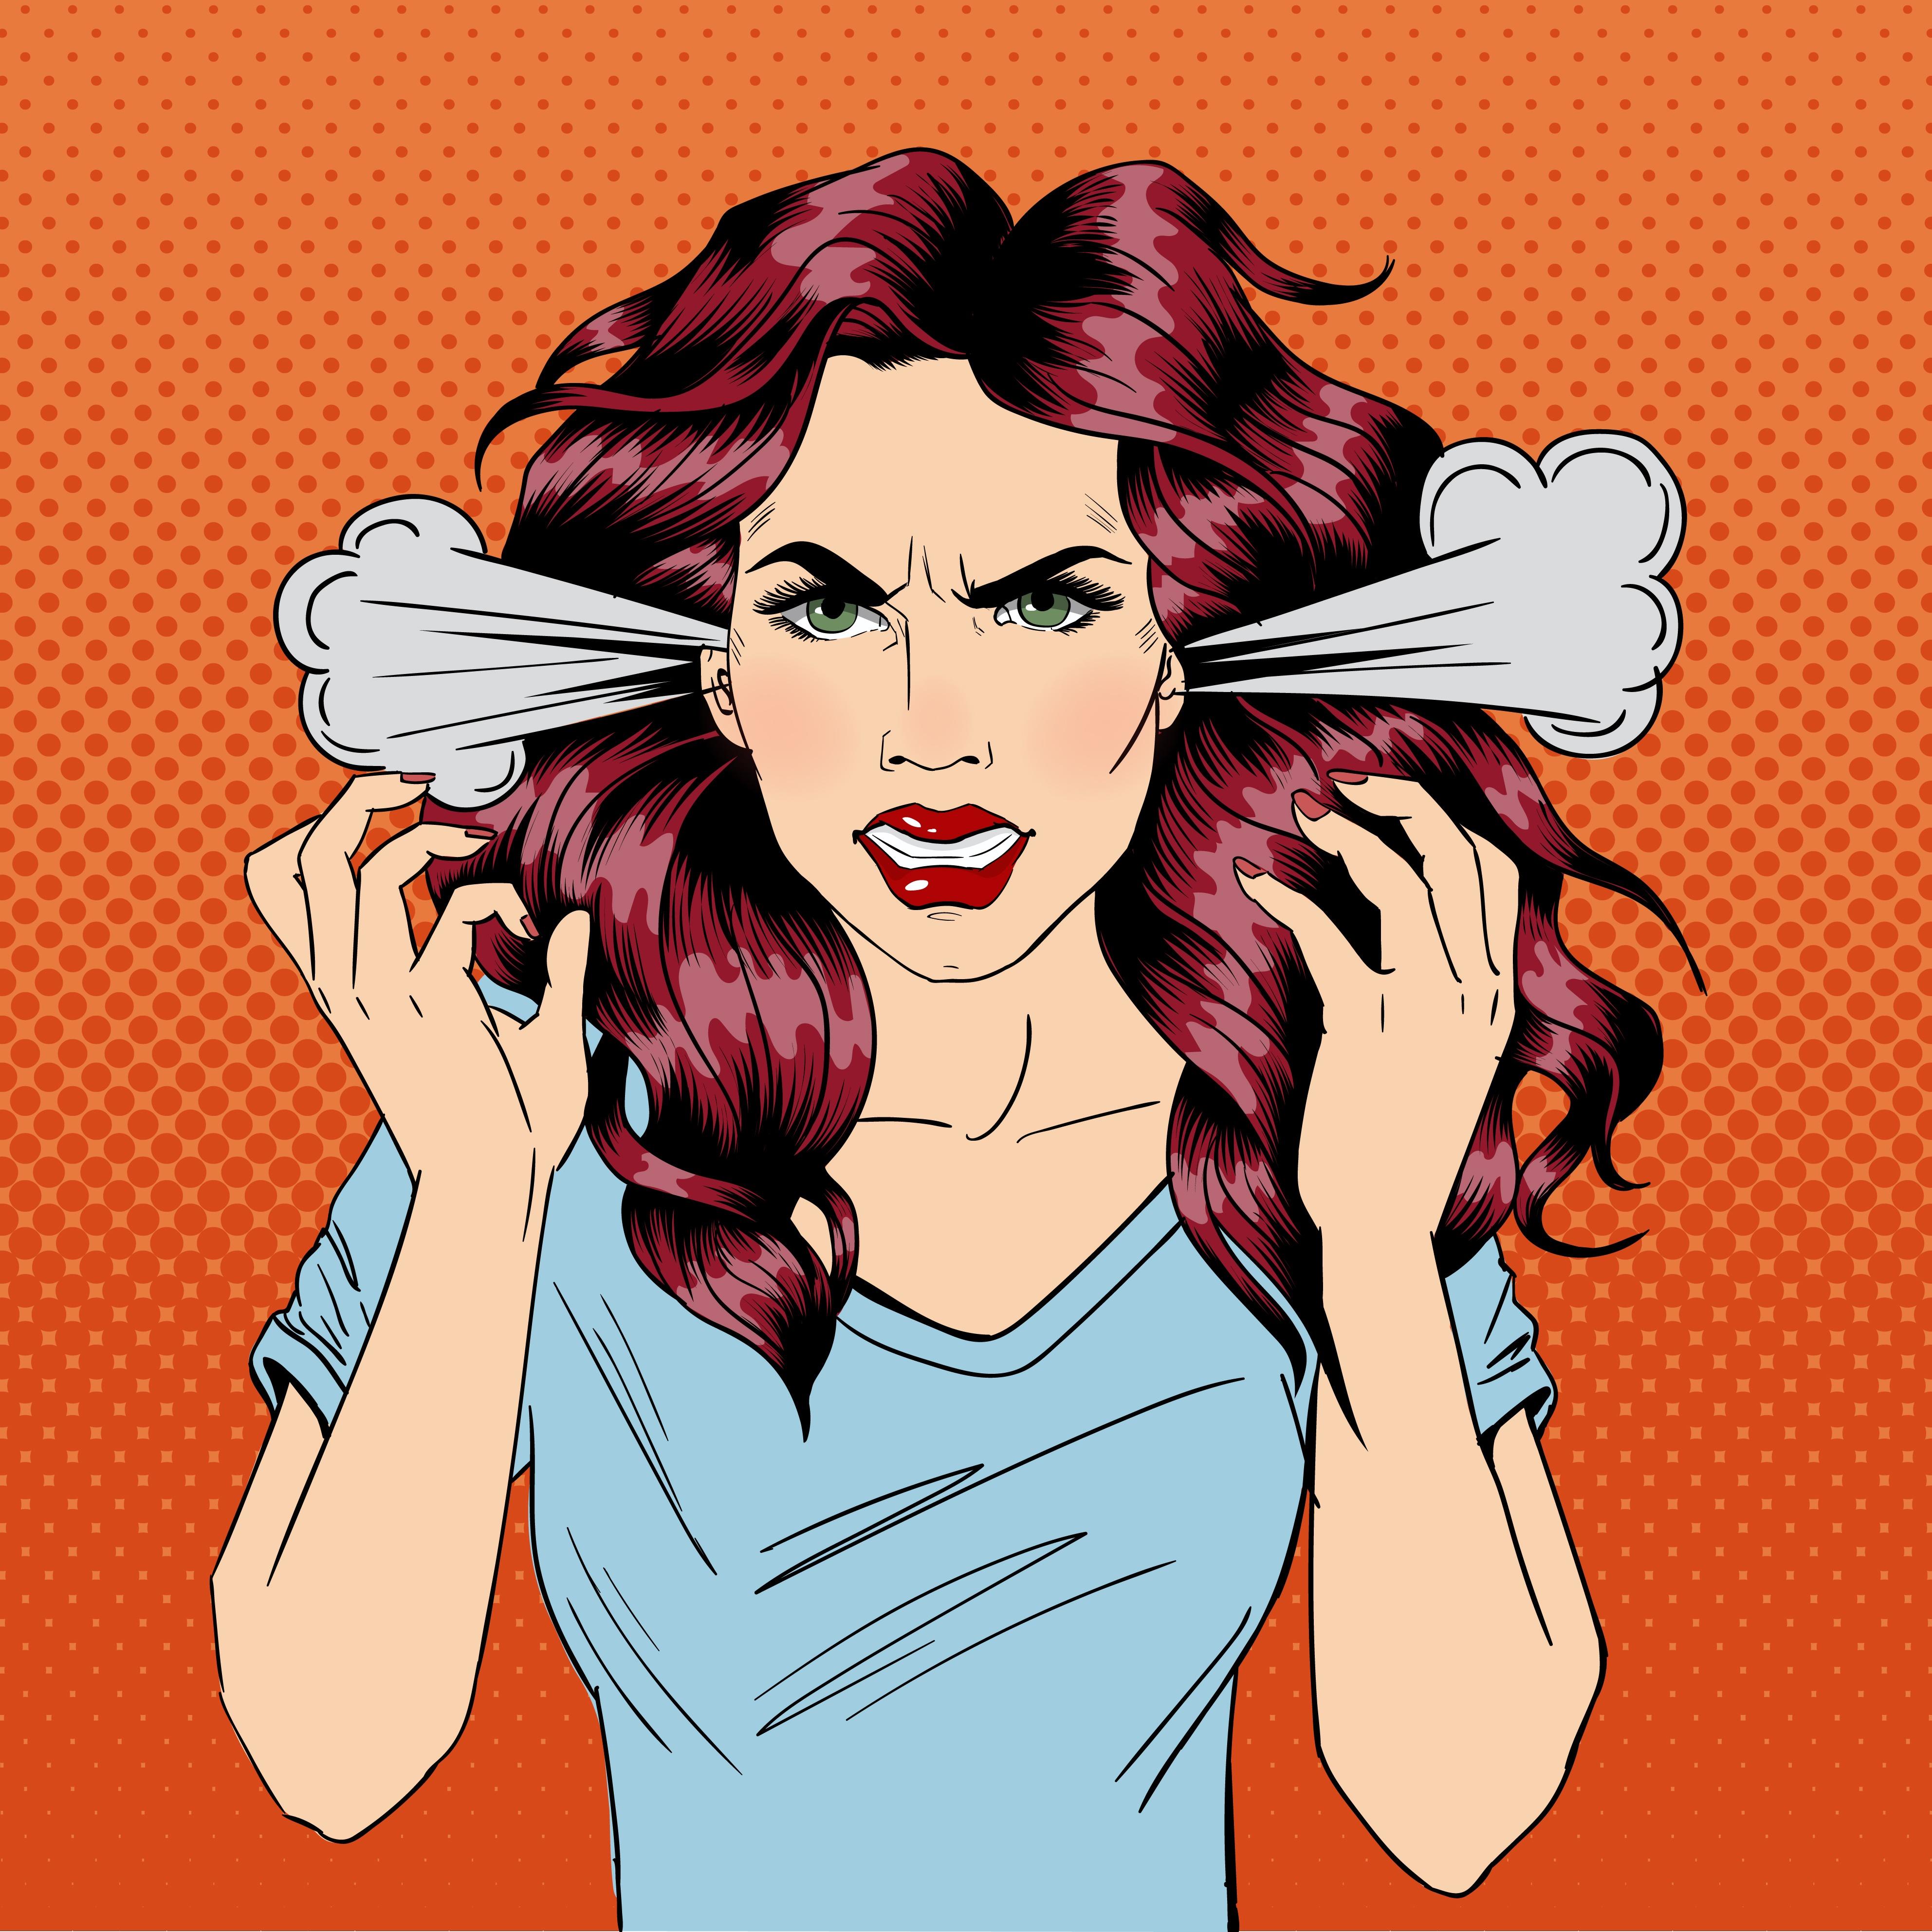 Comic illustration of angry woman